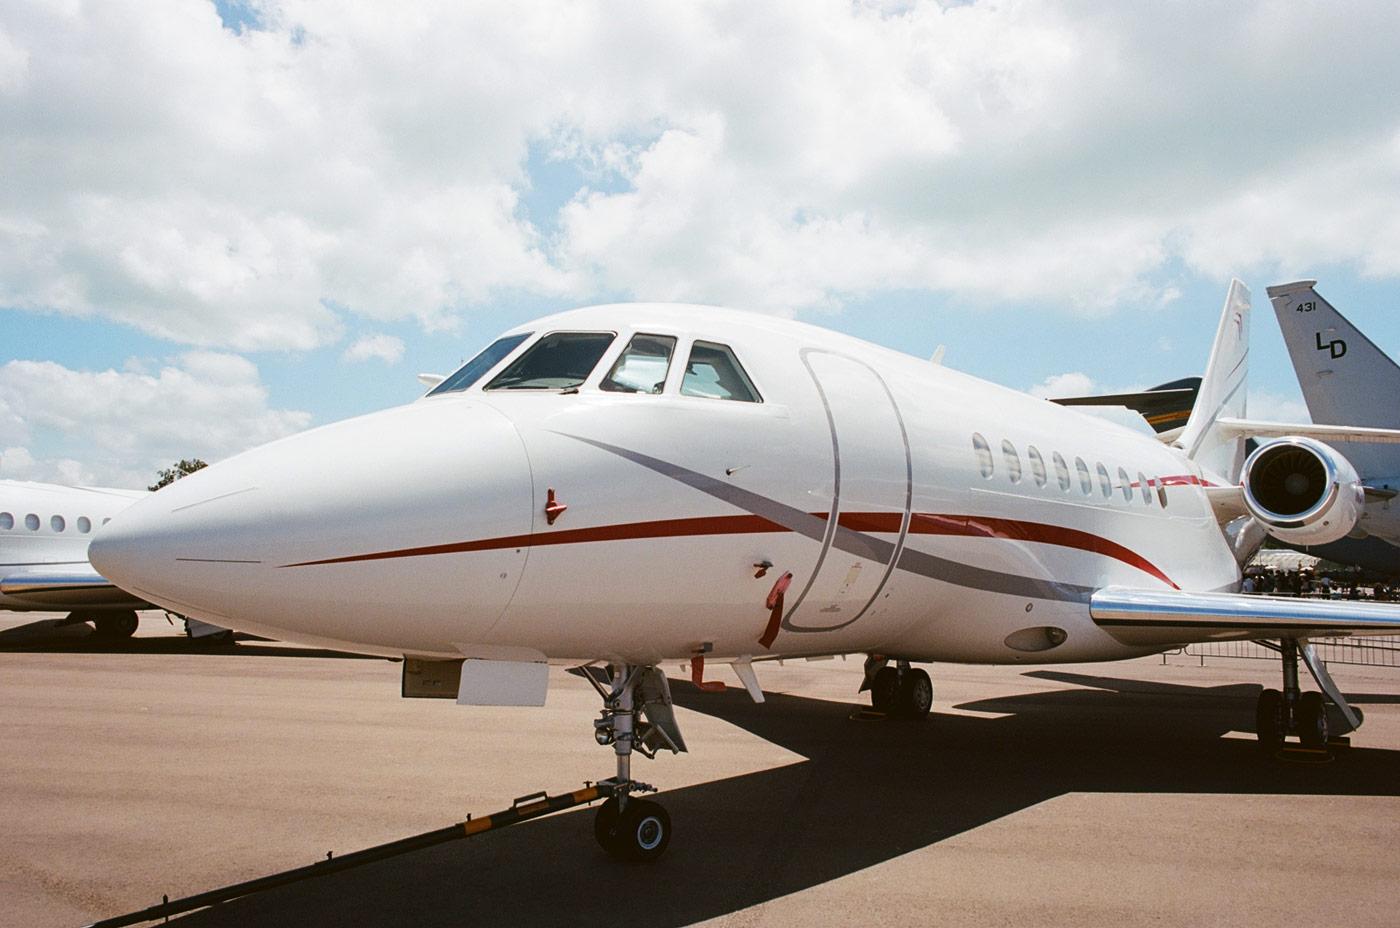 Pro Smith Custom aviation vehicle services